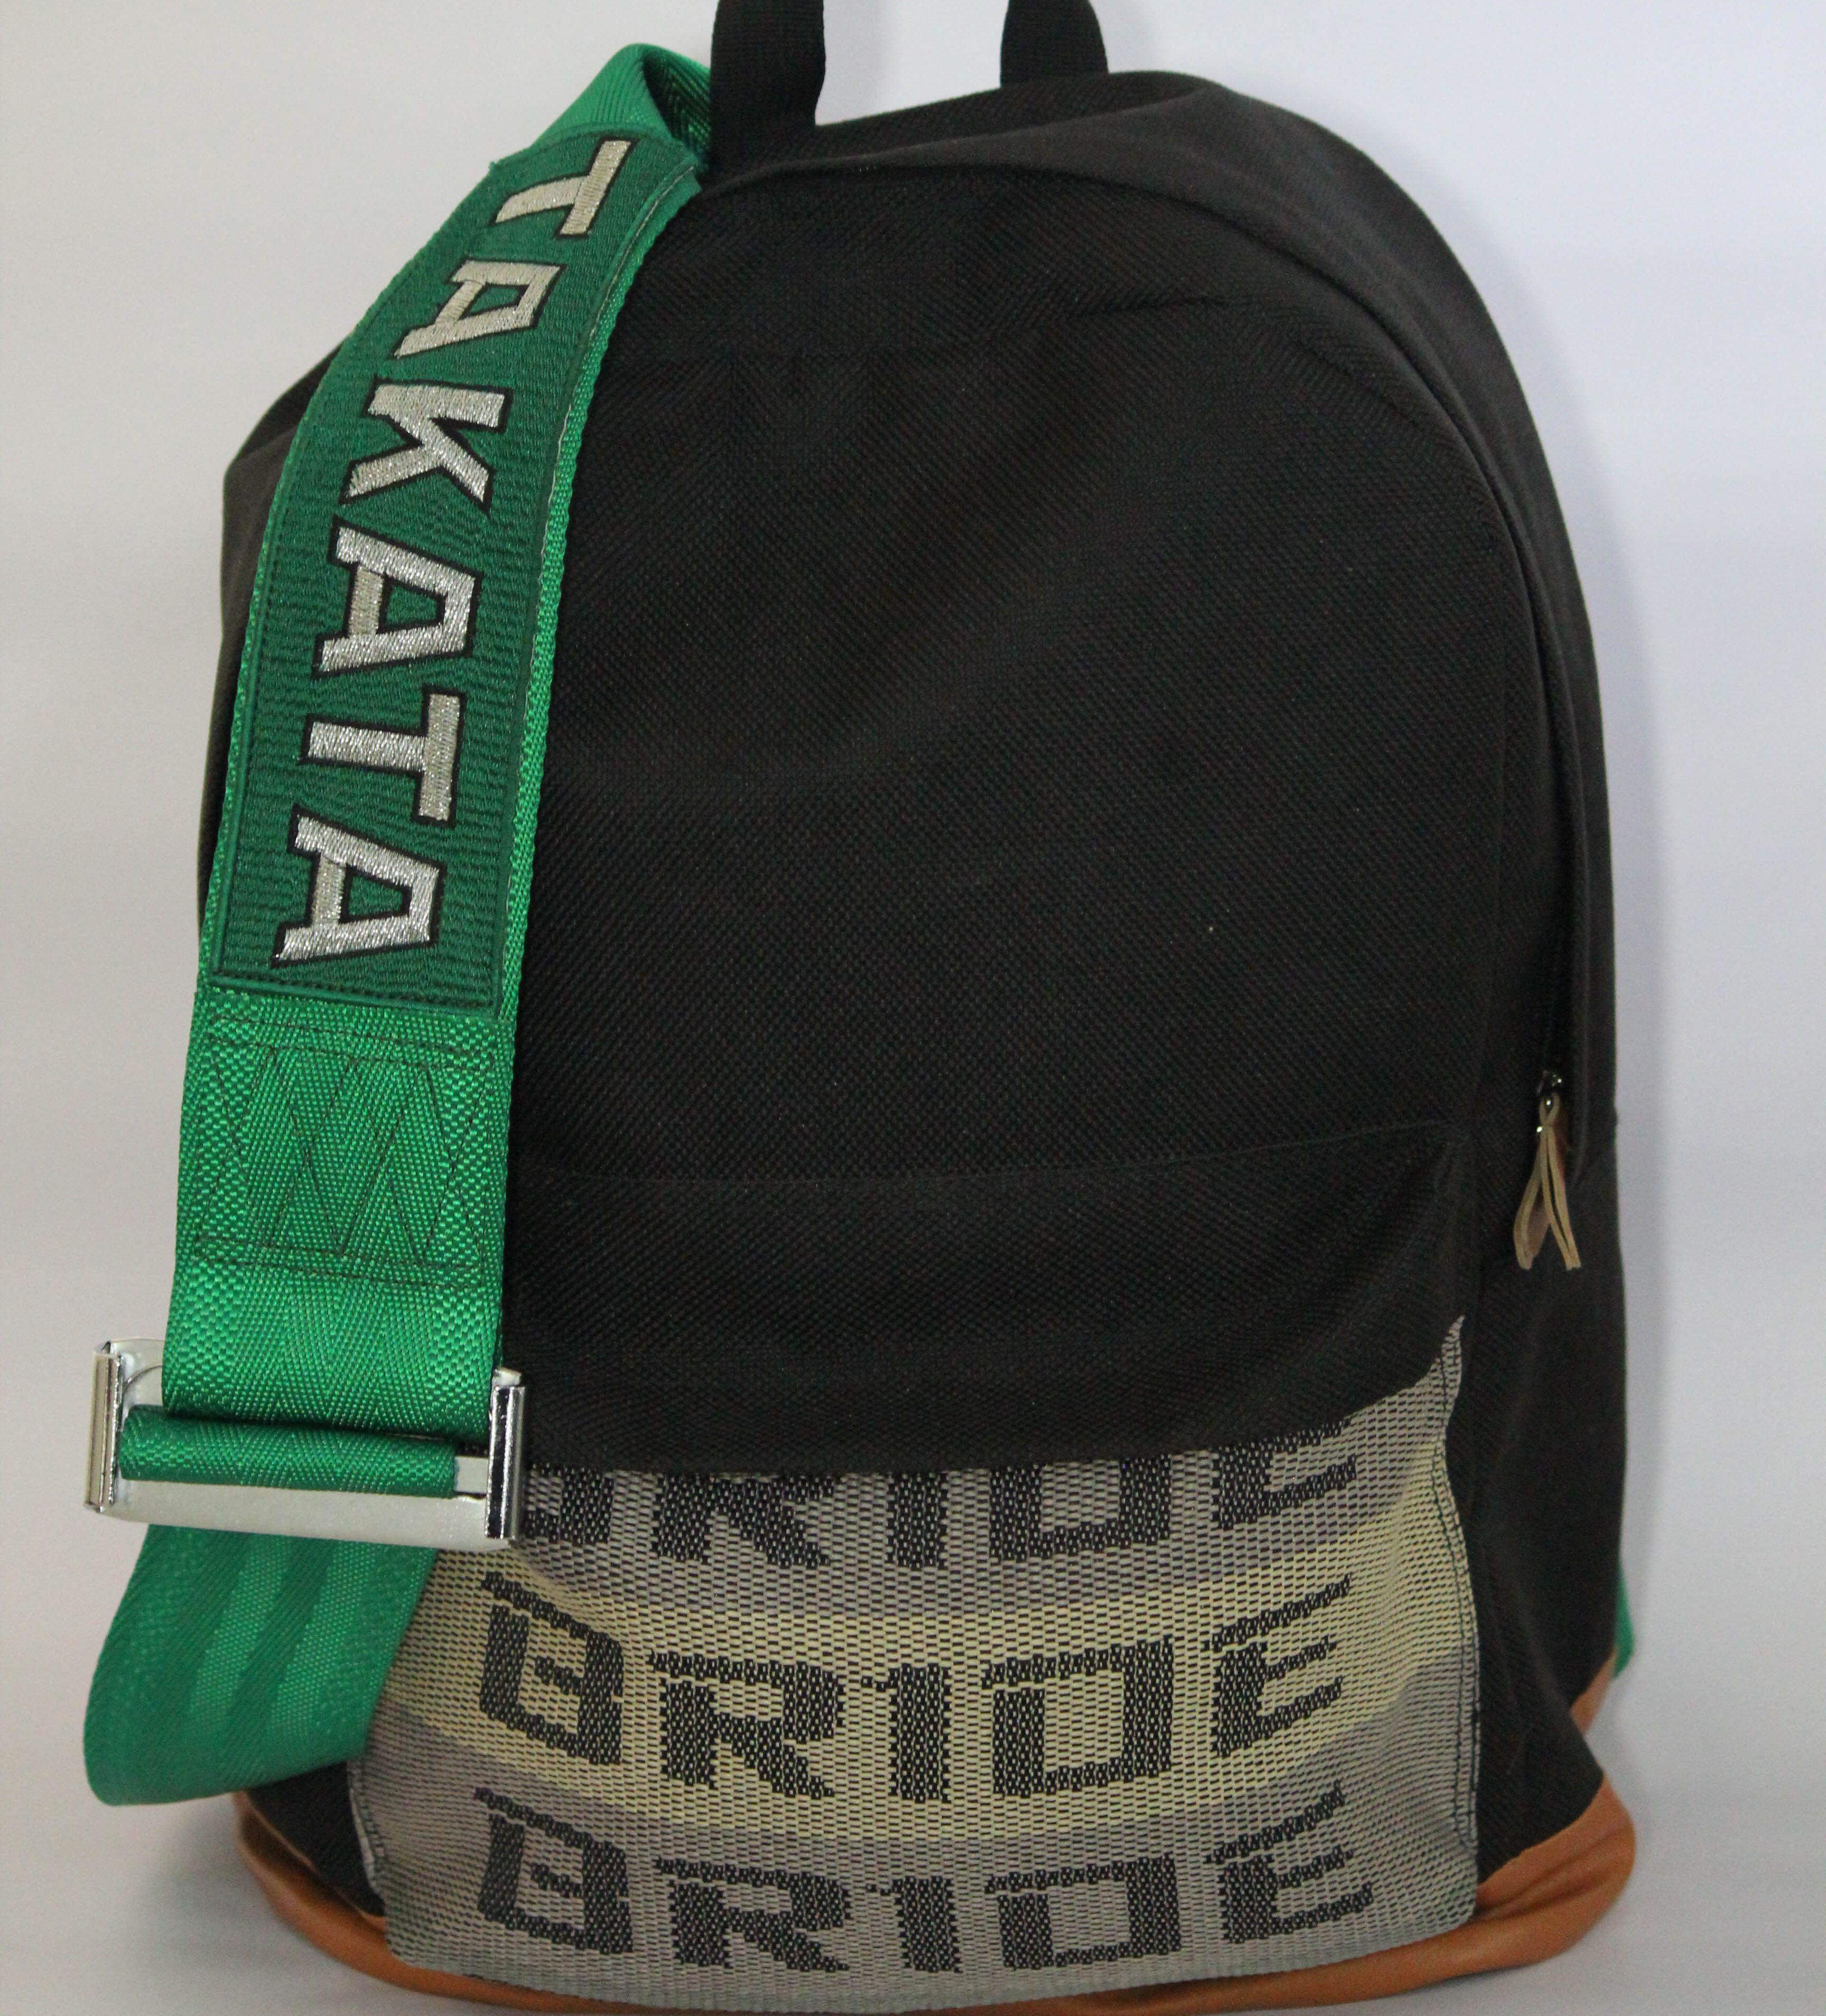 """JDM-ware"" Bride & Takata Harness Backpack Laptop bag (in stock"